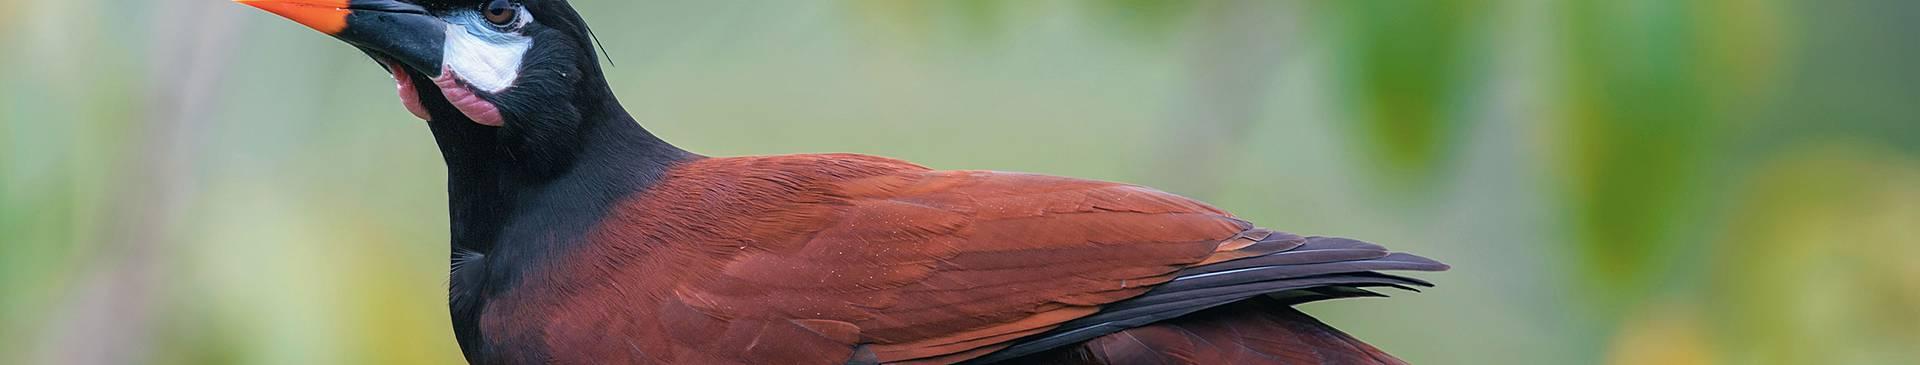 Birdwatching holidays in Costa Rica